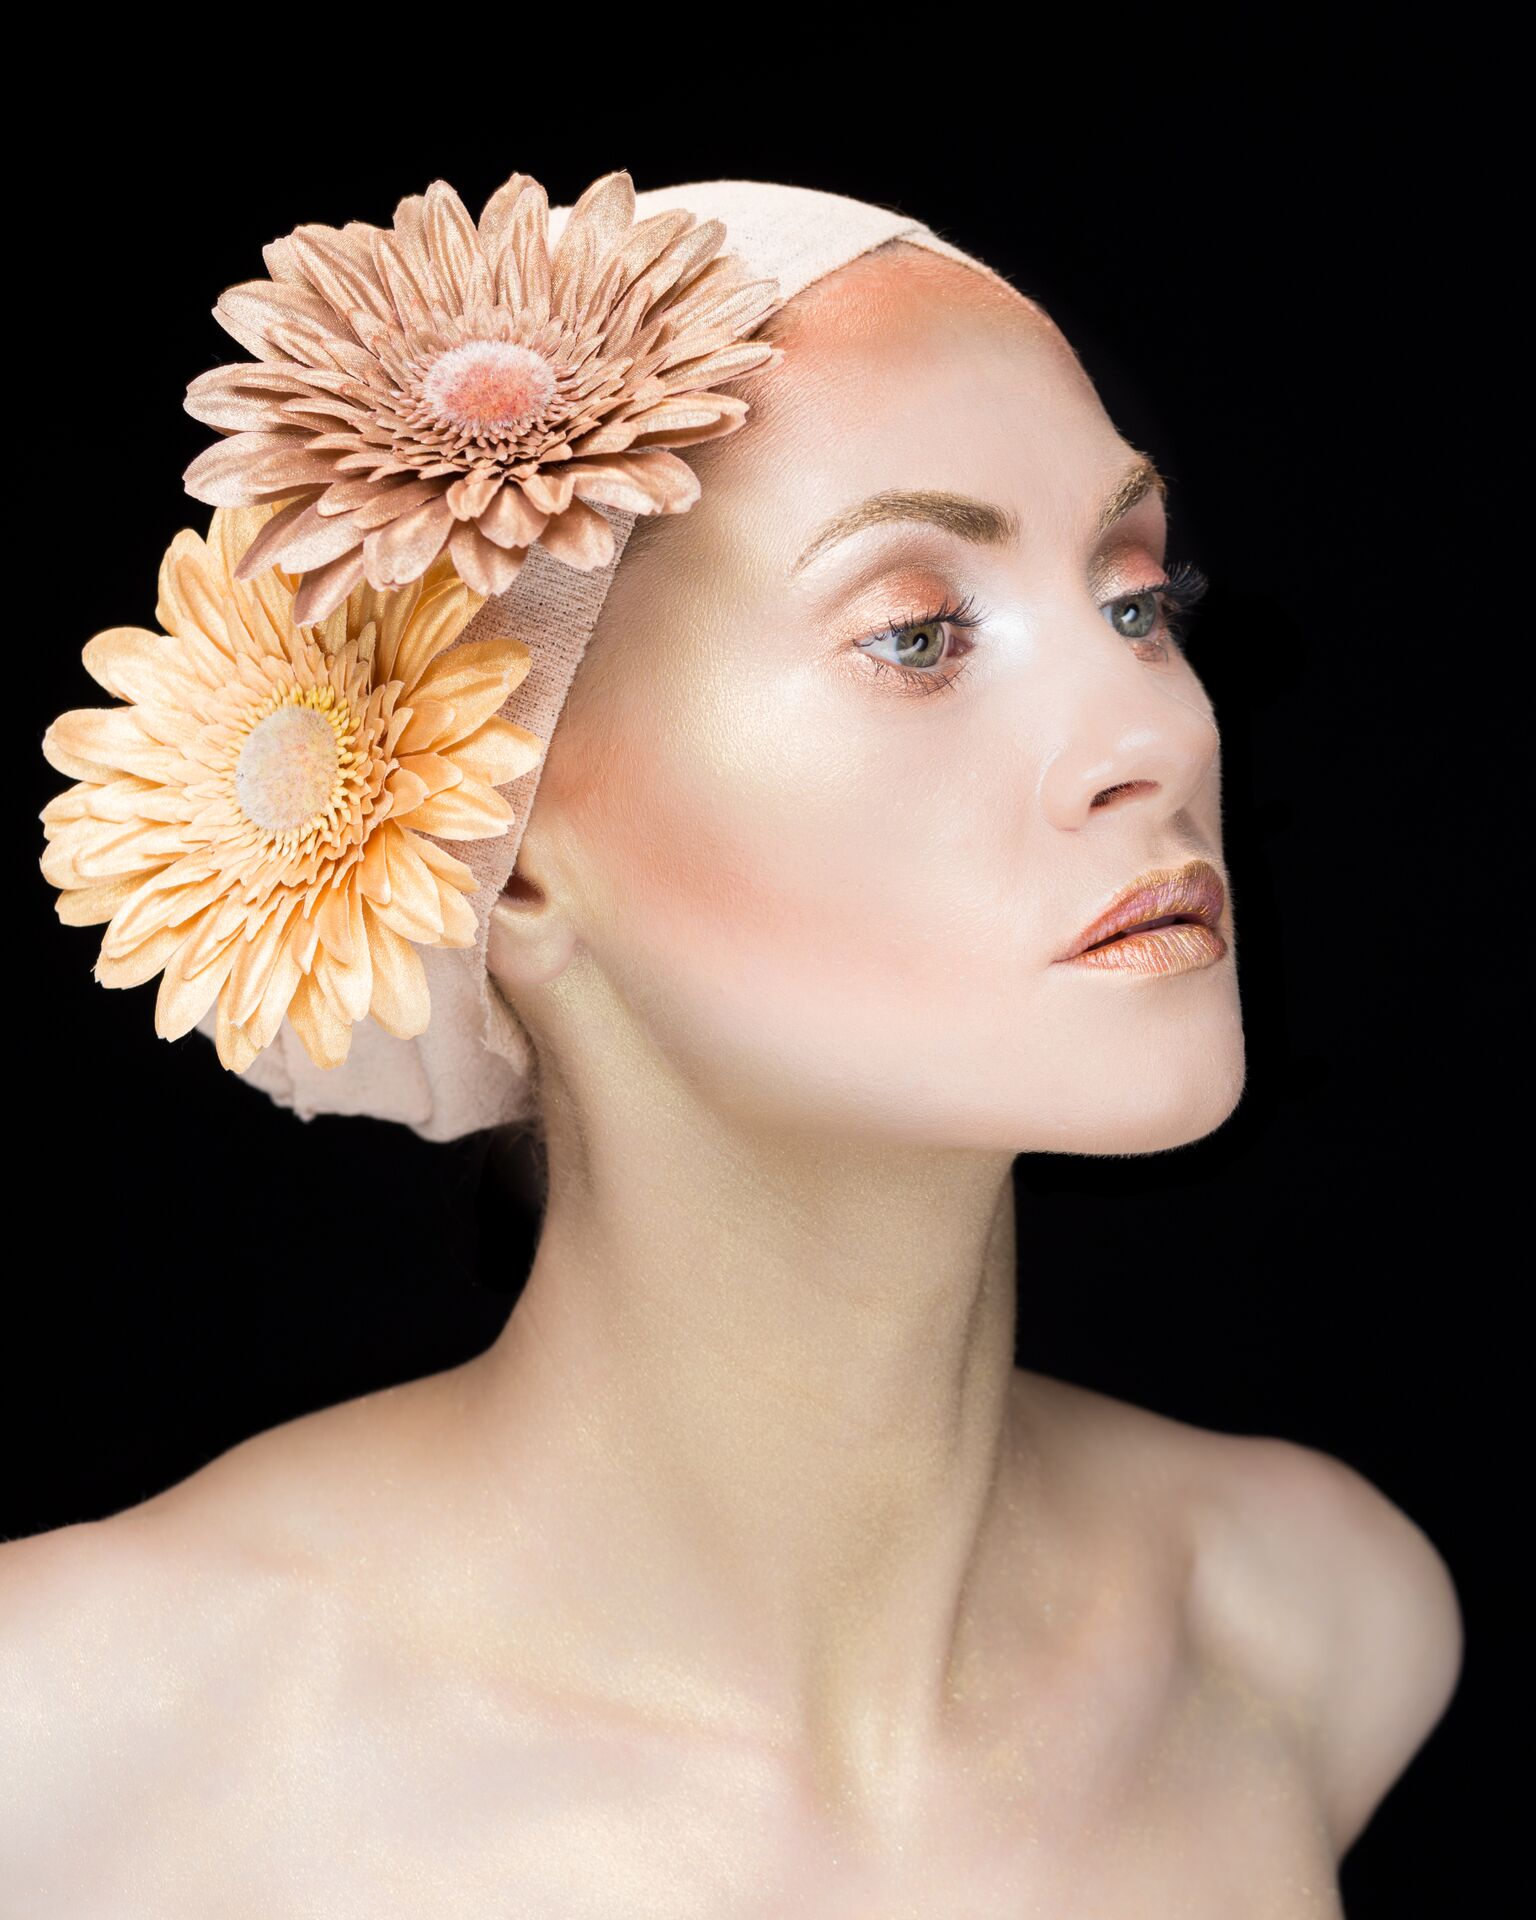 Photography: Margaret Jablonski